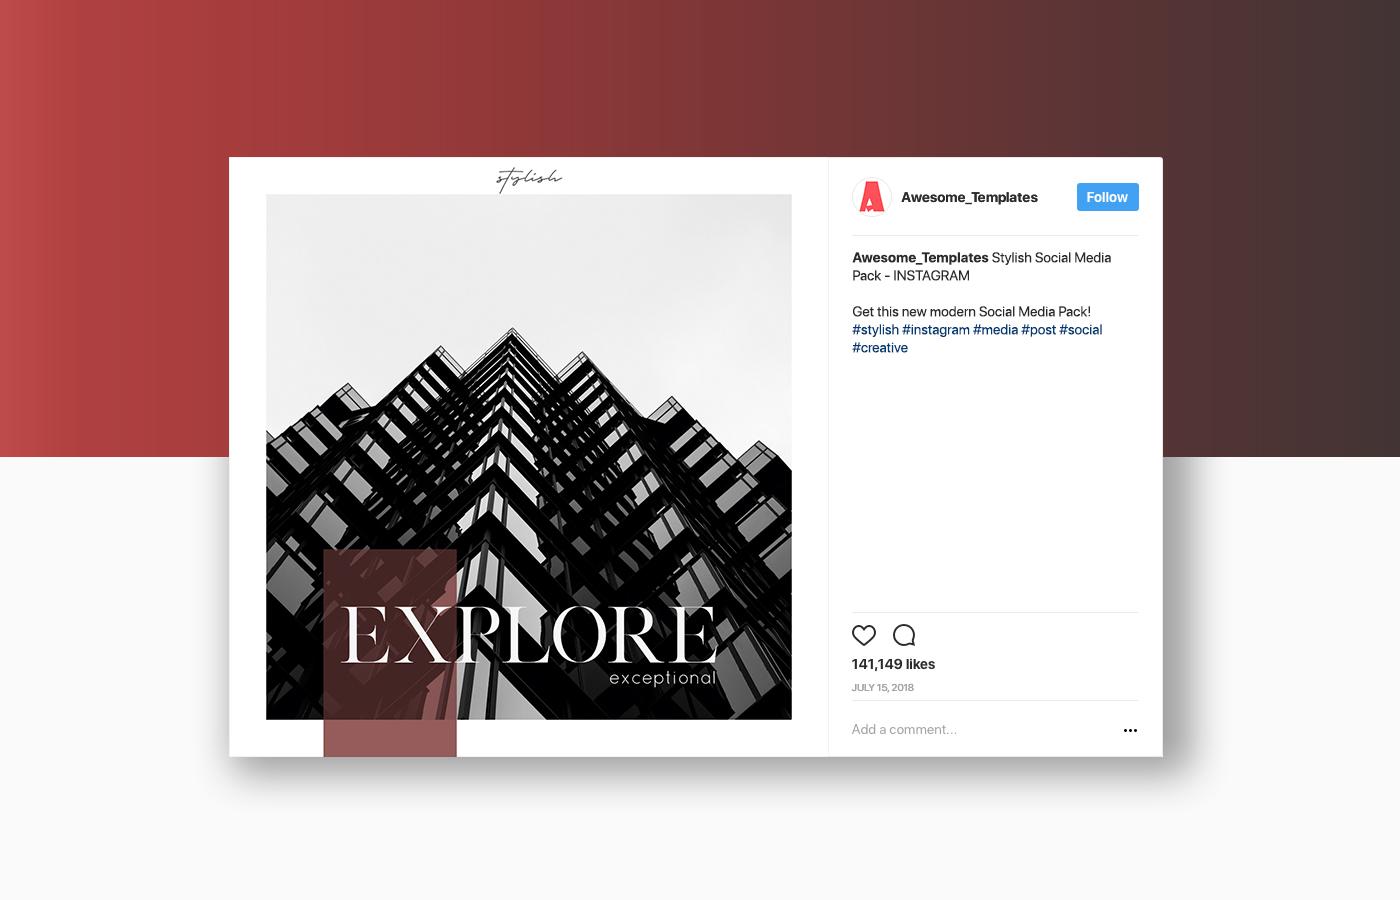 Stylish Social Media Pack - Instagram example image 6